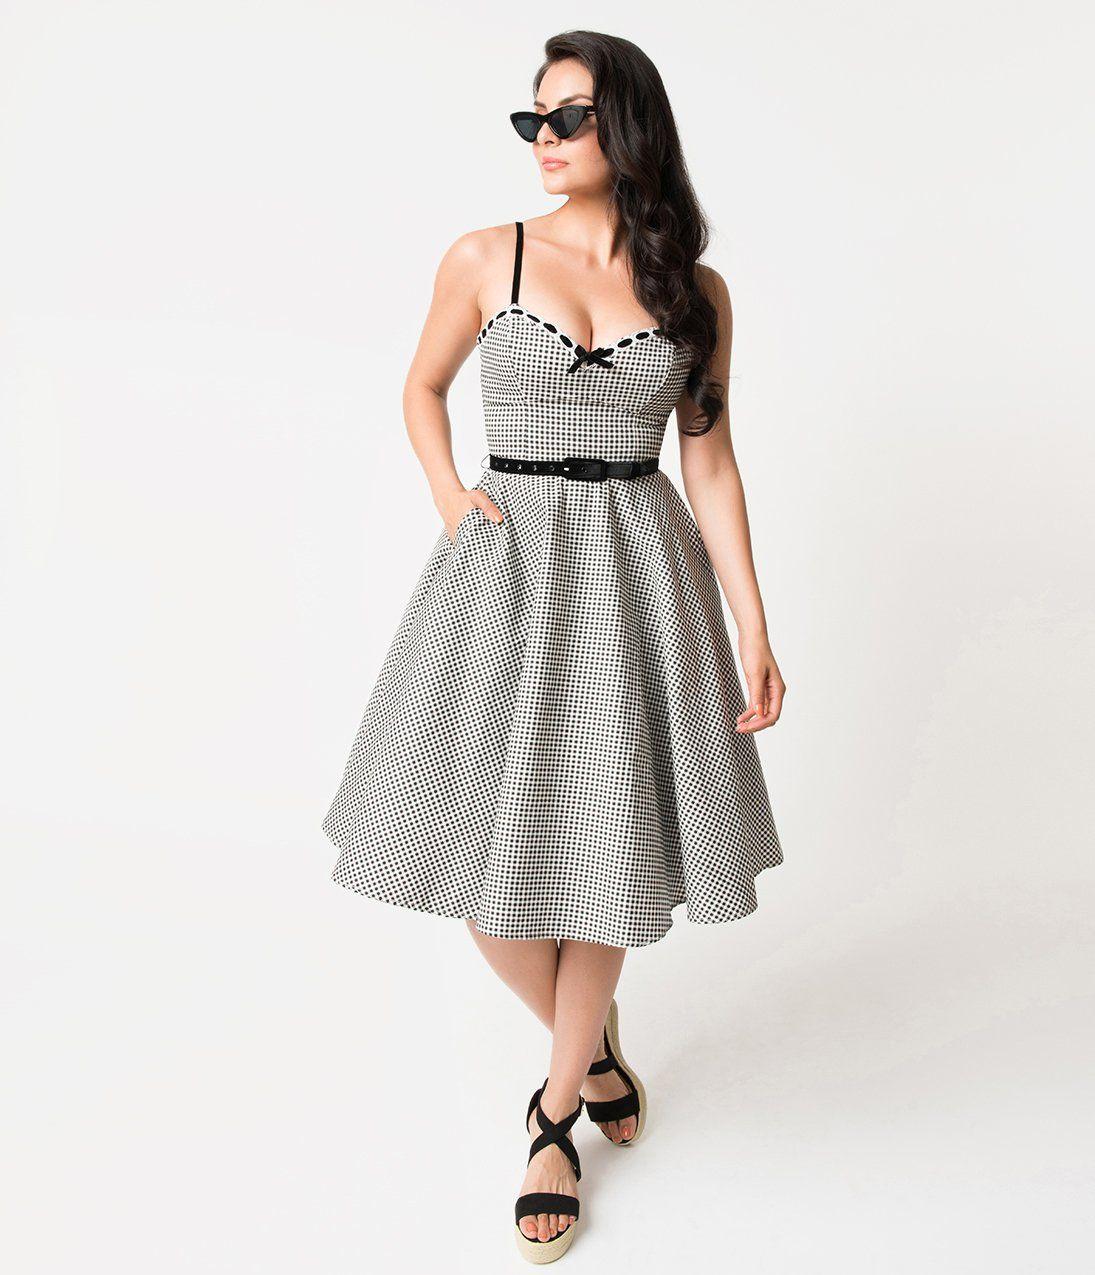 Micheline Pitt For Unique Vintage 1950s Style Black White Gingham Be Vintage Fashion 1950s Fashion Vintage Fashion 1950s